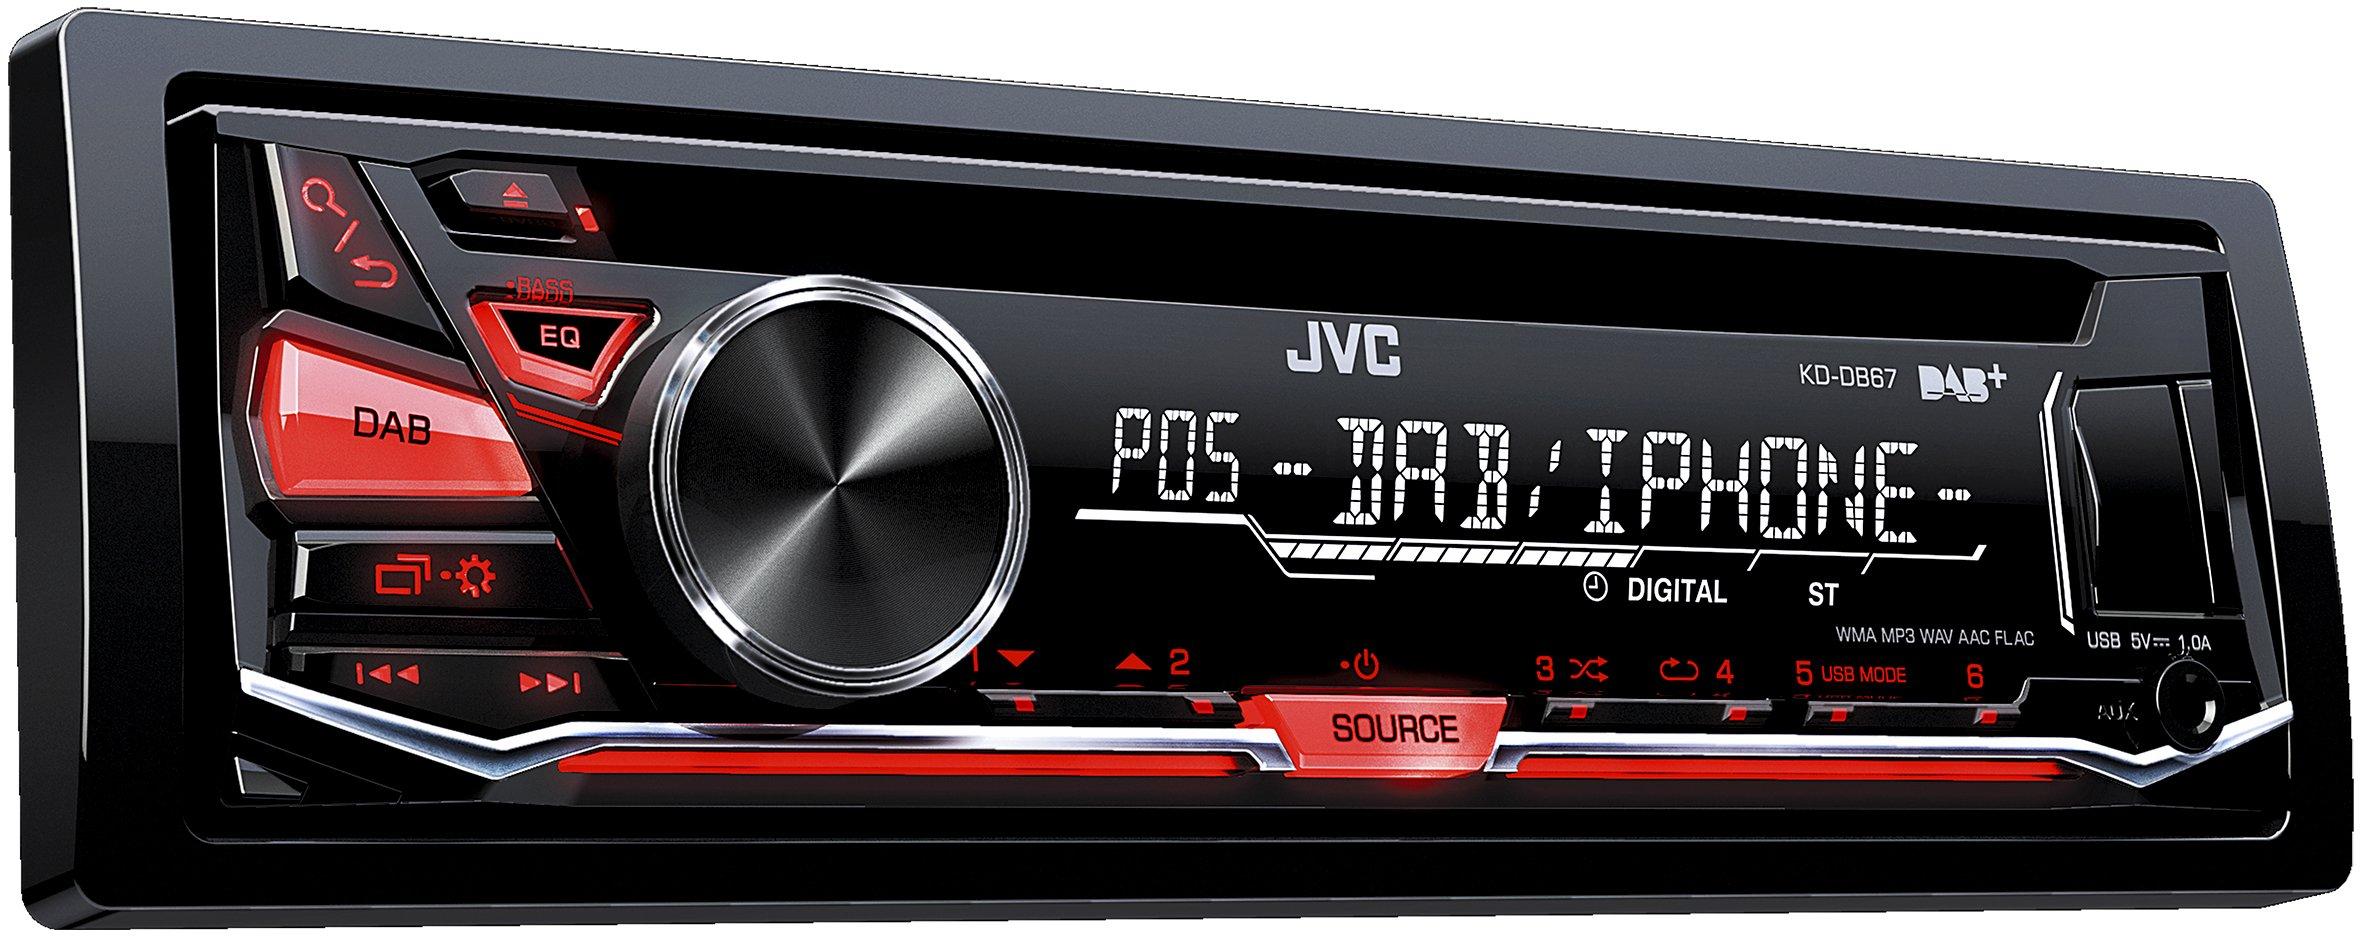 JVC-KD-DB67-USBCD-Receiver-DAB-Front-AUX-schwarz